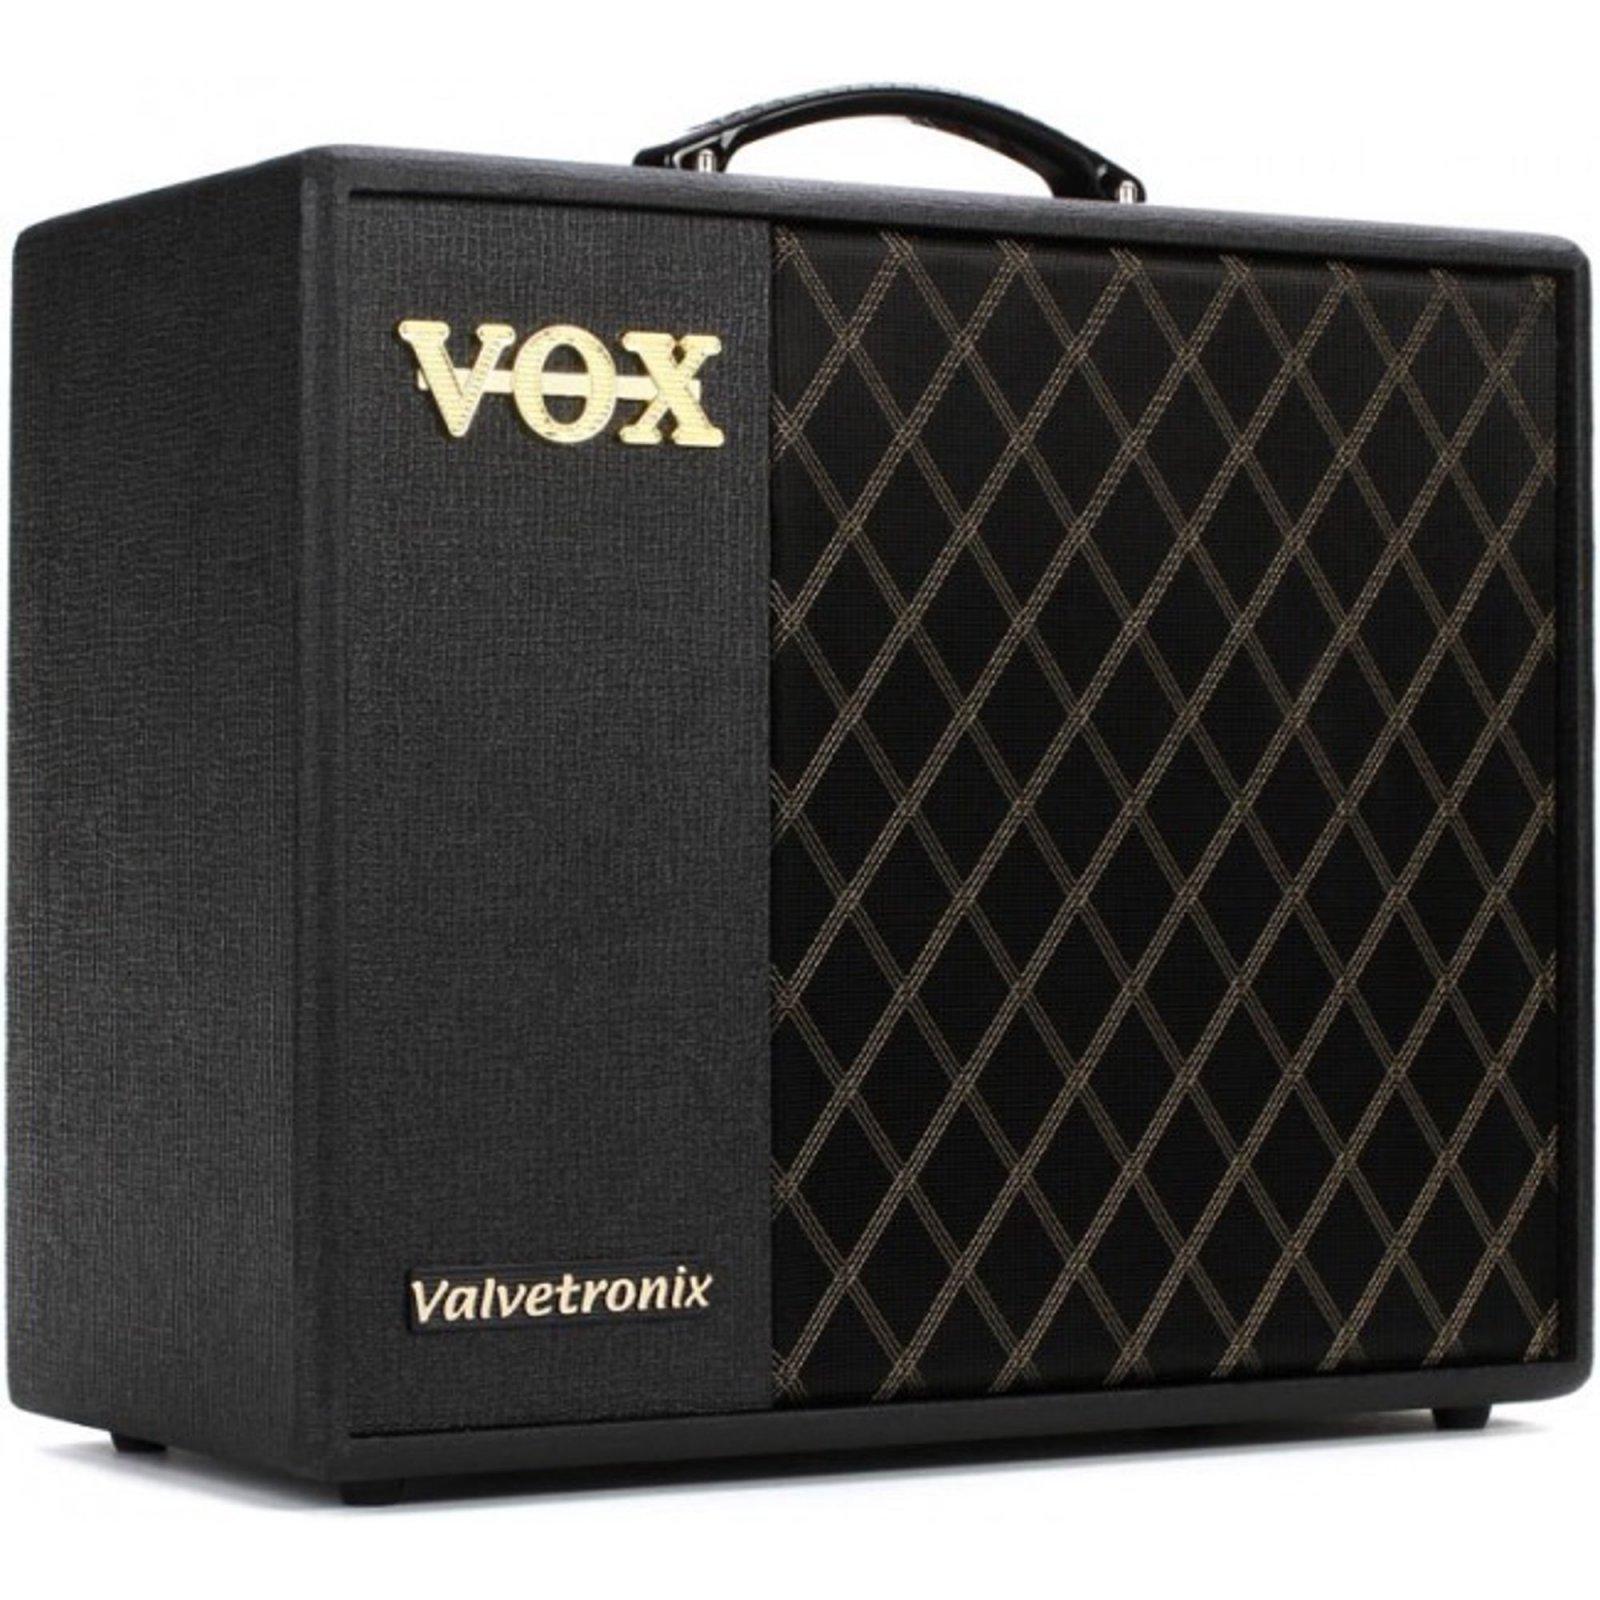 Vox VTX 40 Watt Hubrid Tube Modeling Amp - USB Control